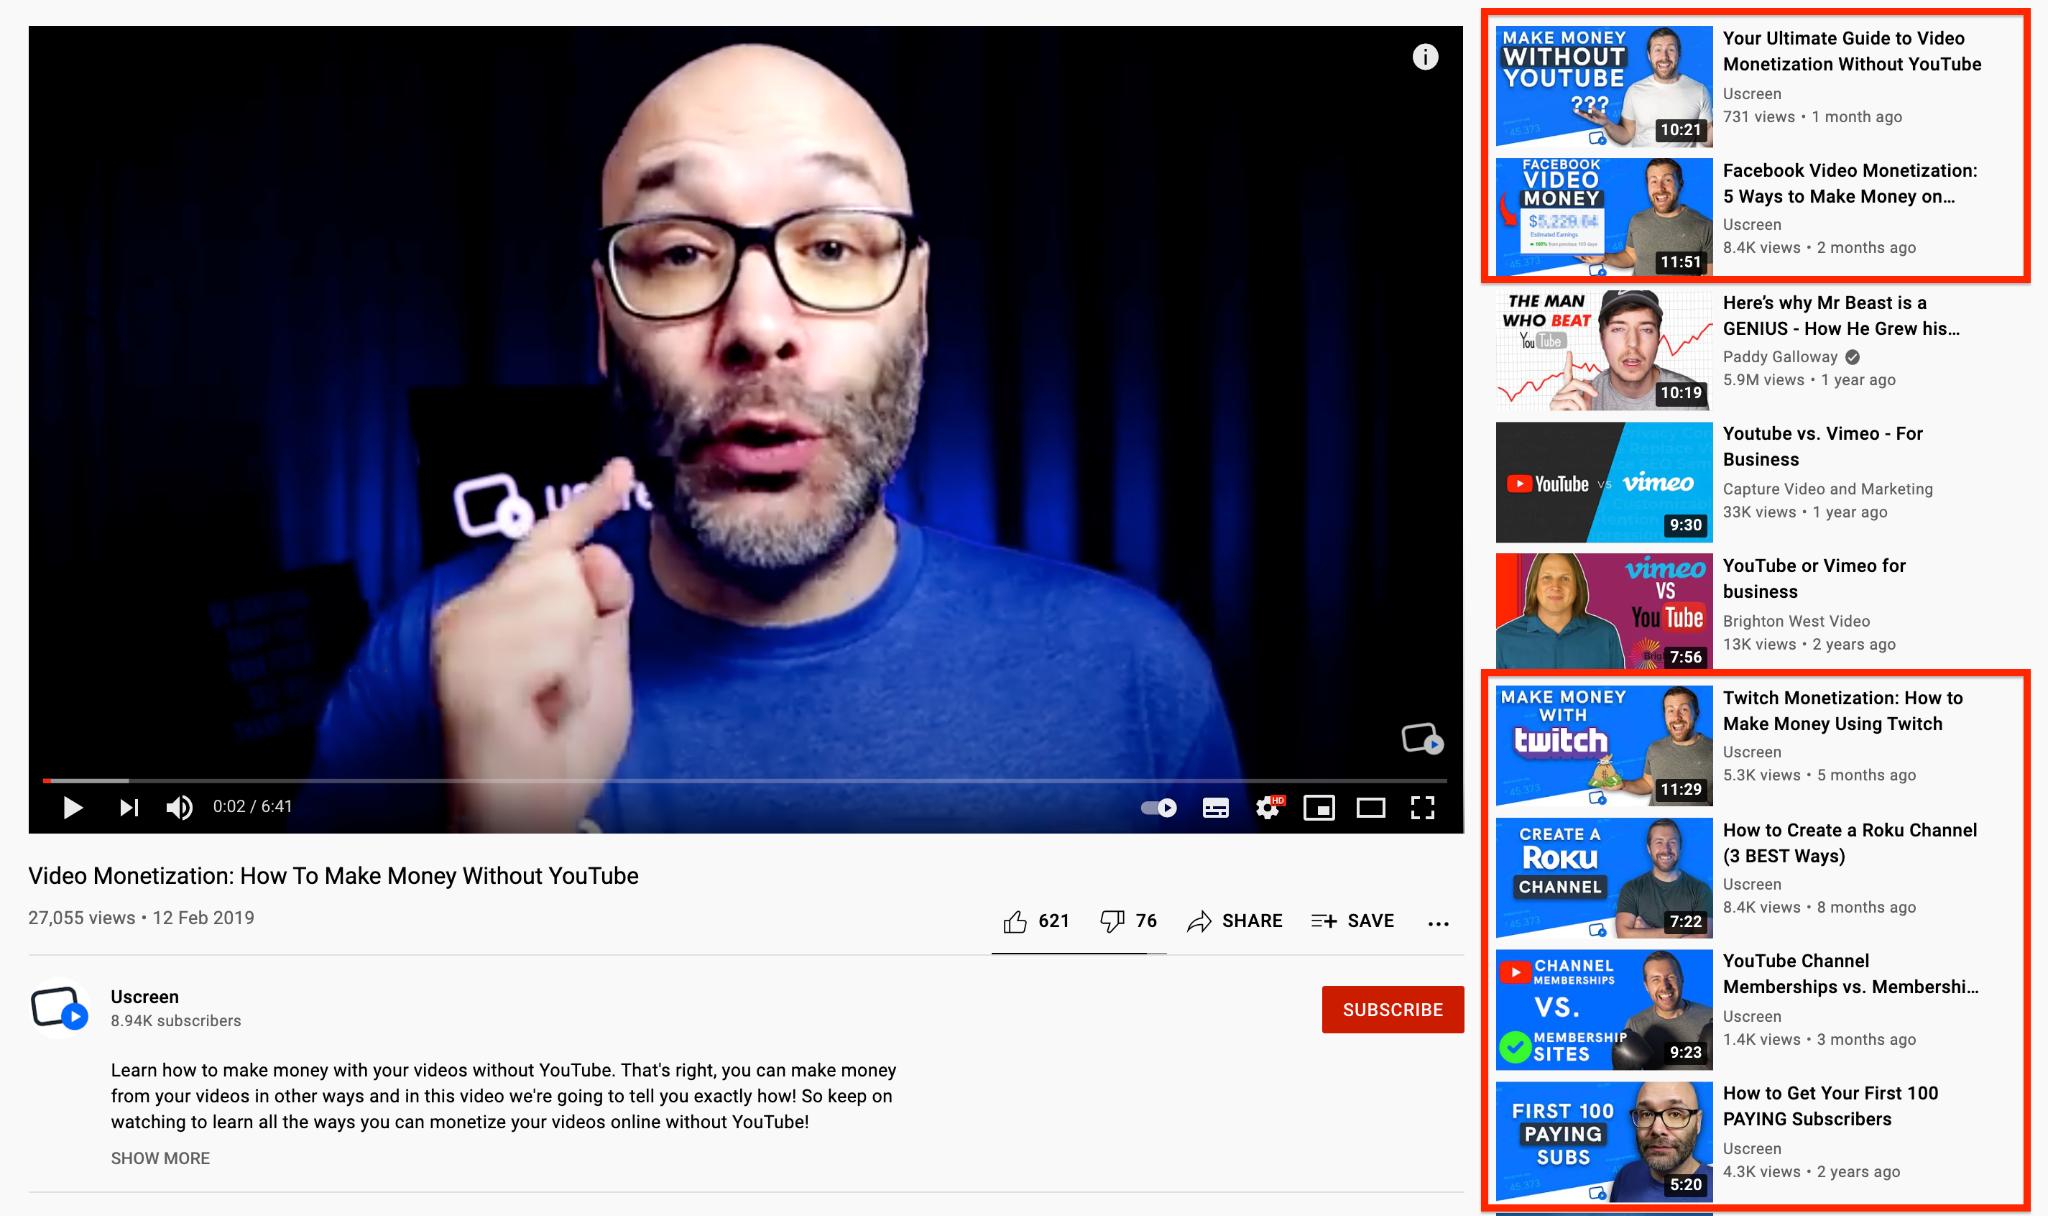 Uscreen youtube channel screenshot